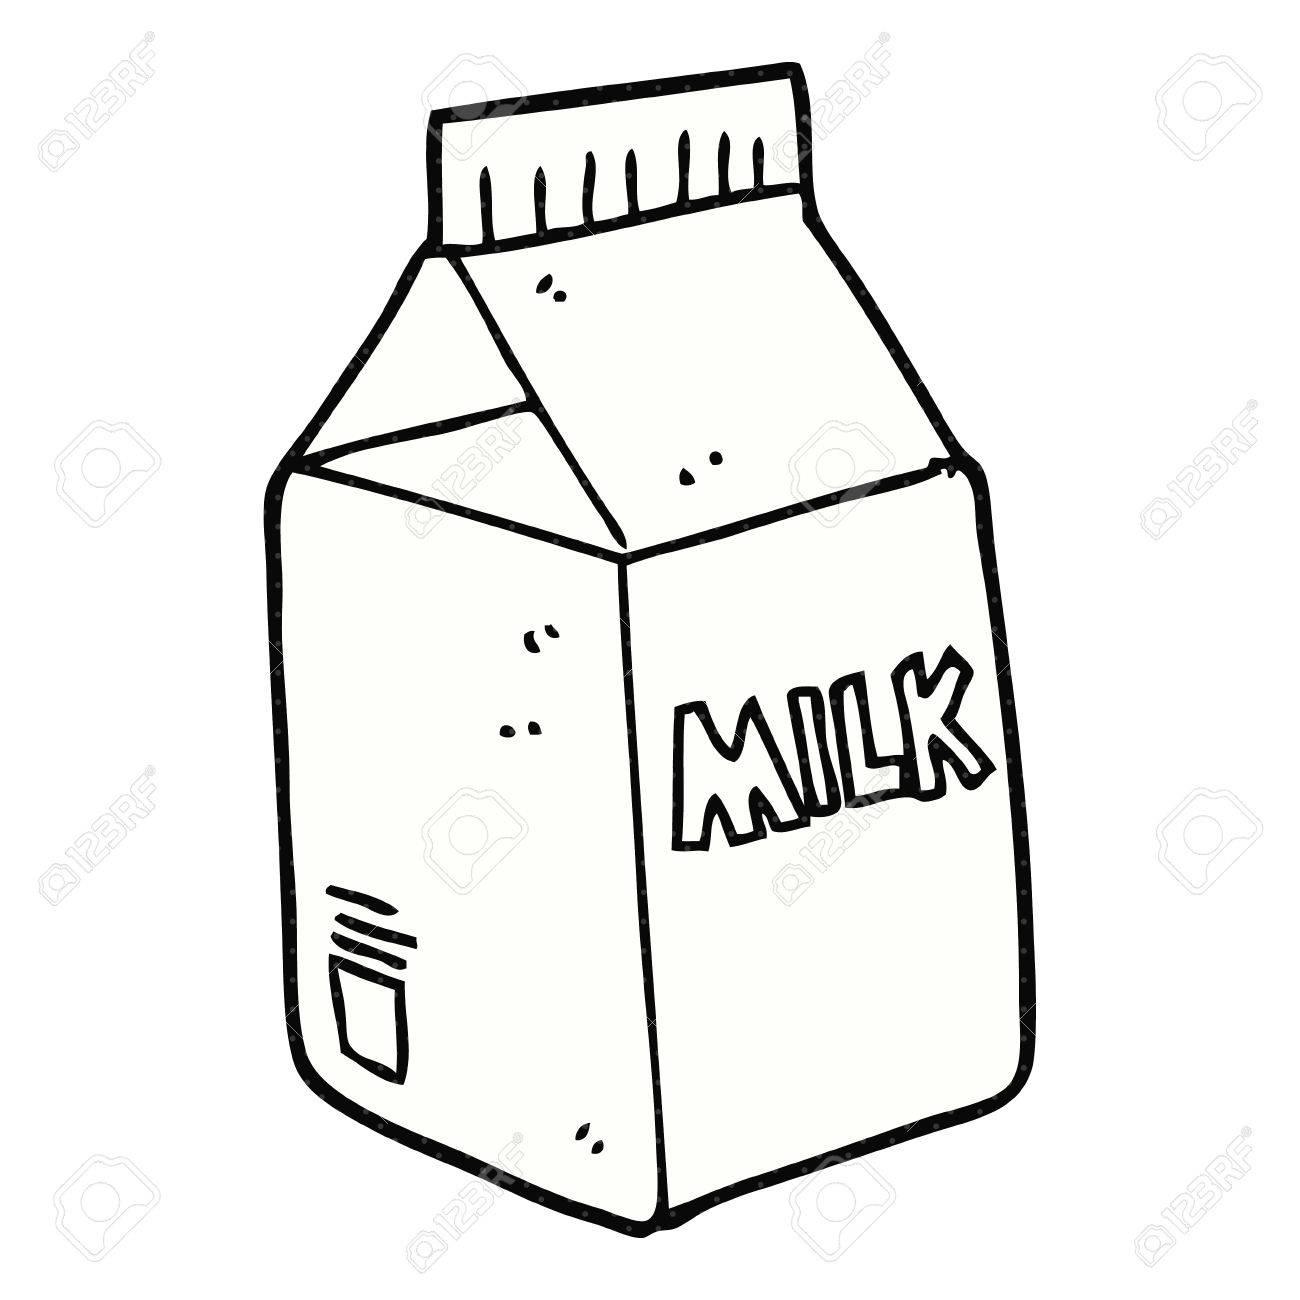 freehand drawn cartoon milk carton royalty free cliparts vectors rh 123rf com milk carton cartoon image milk carton cartoon